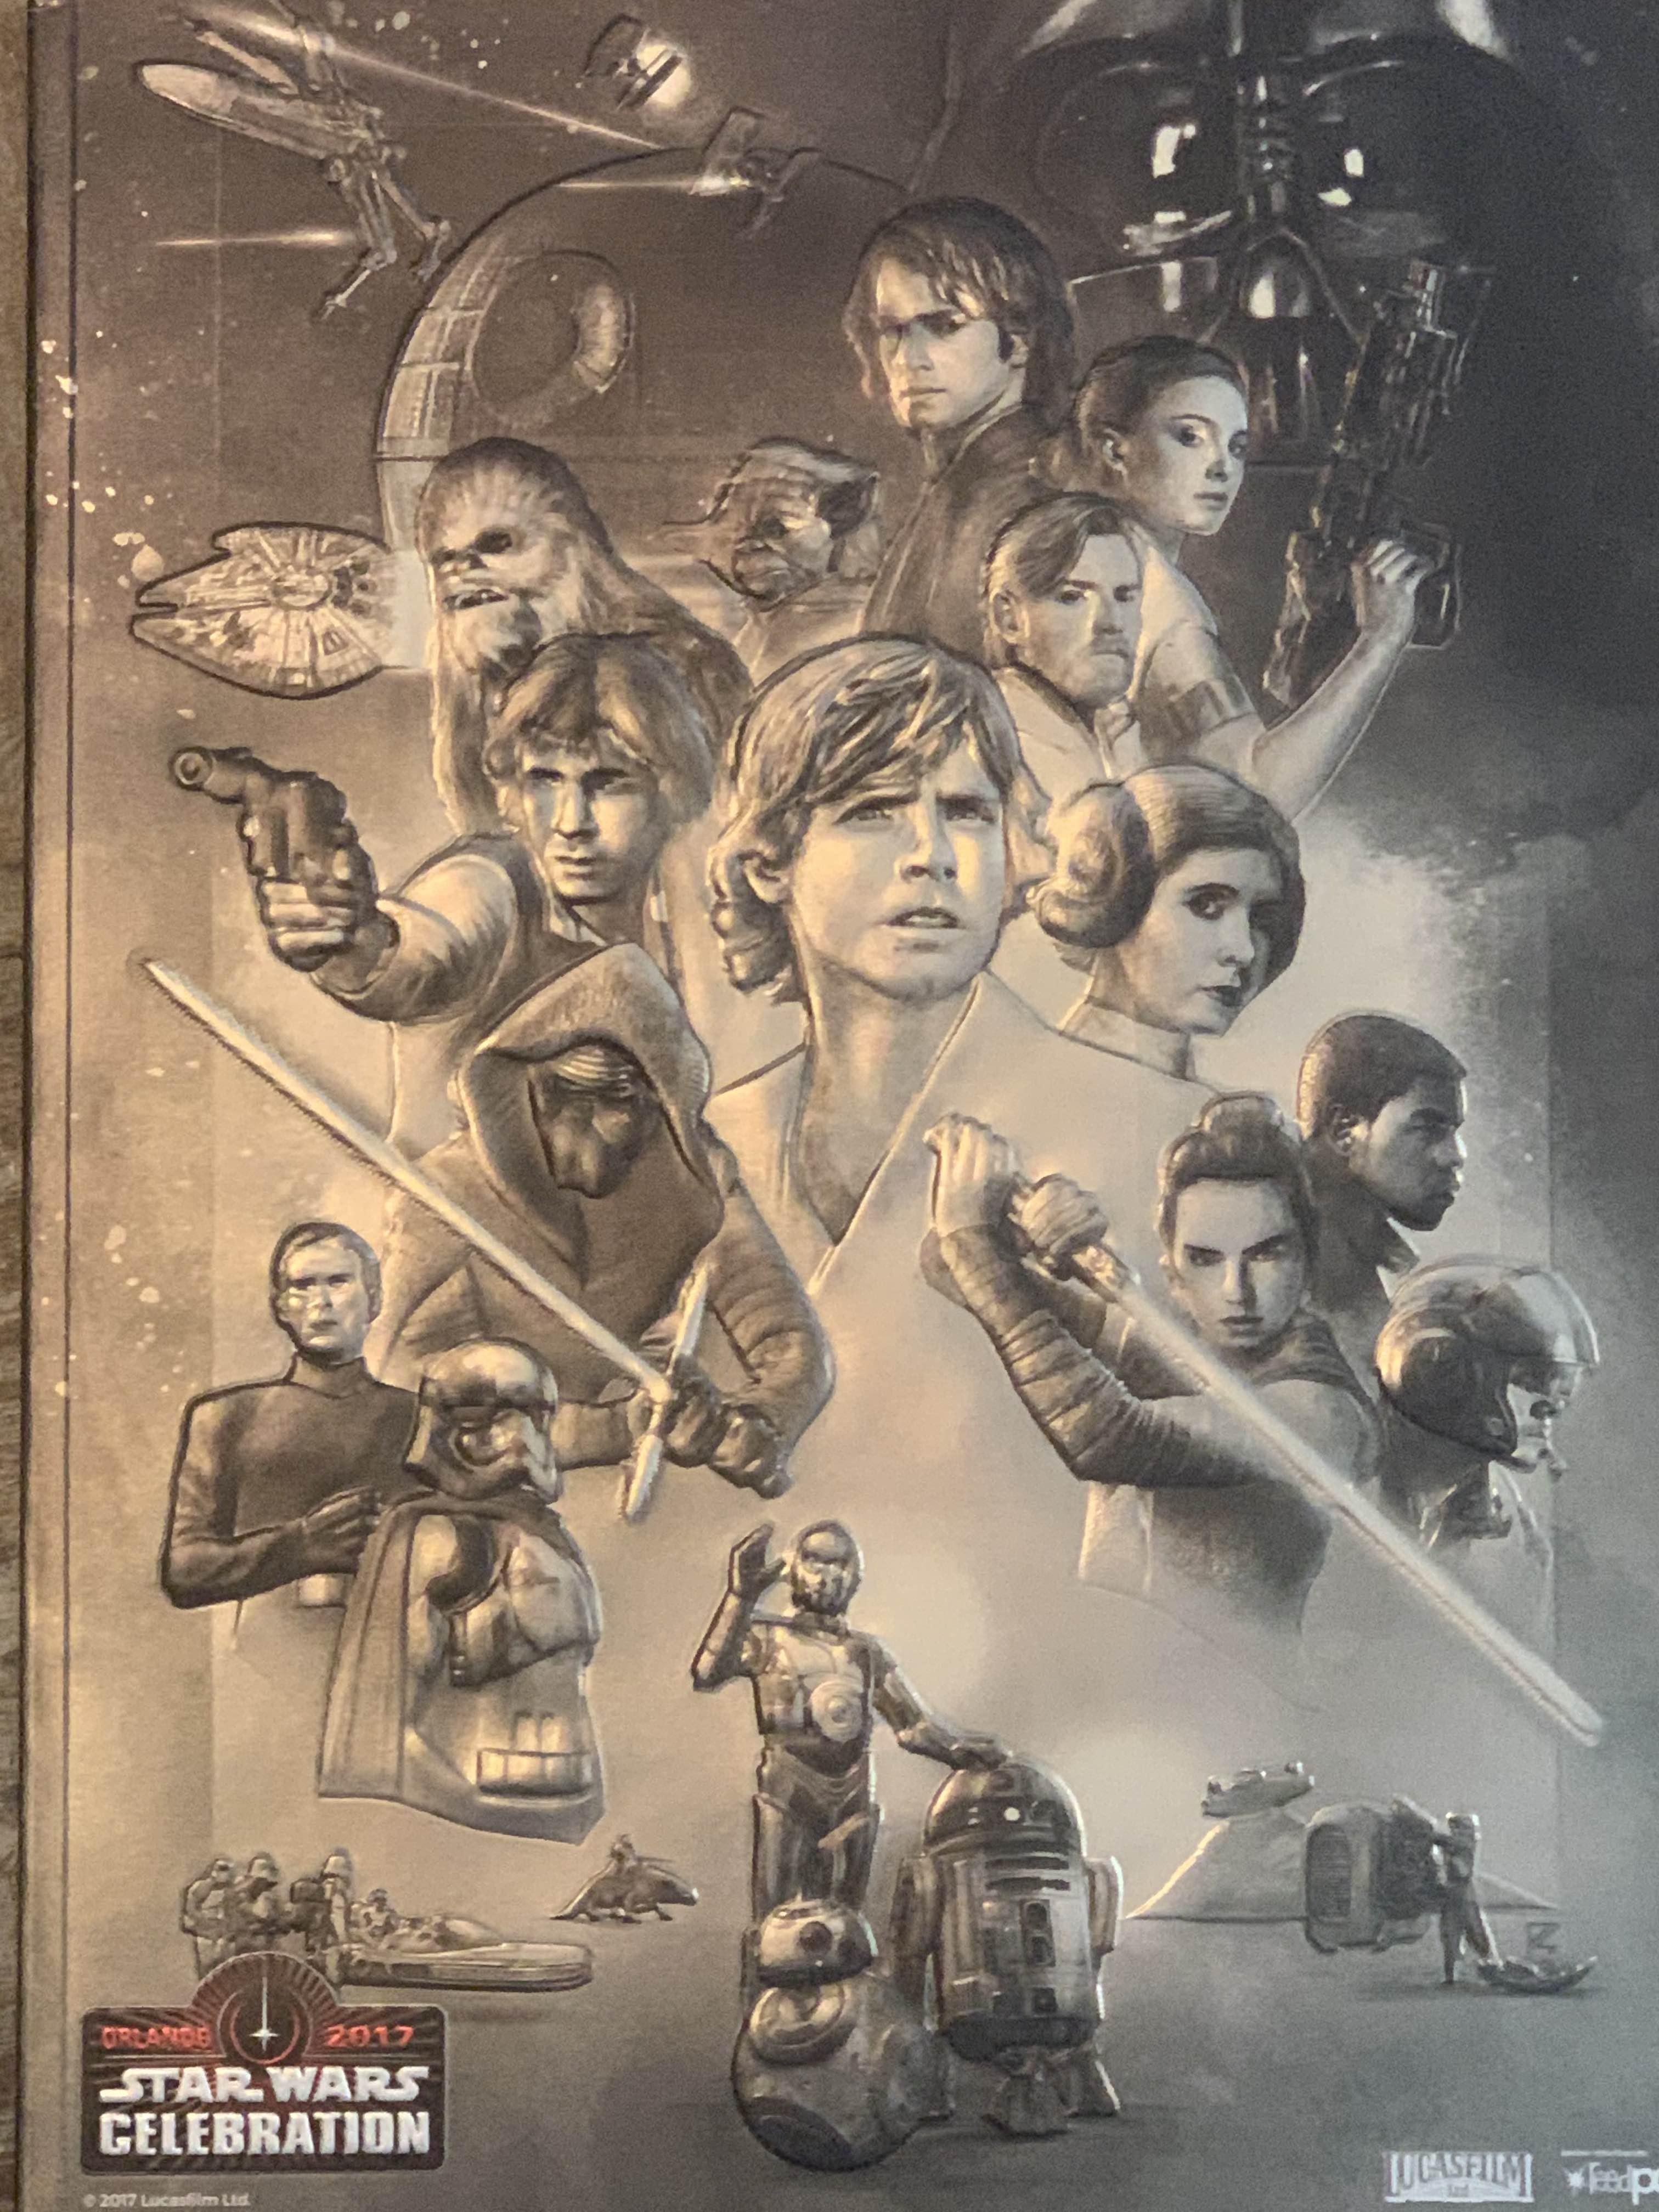 Star Wars Celebration Orlando 2017 Souvenir Program